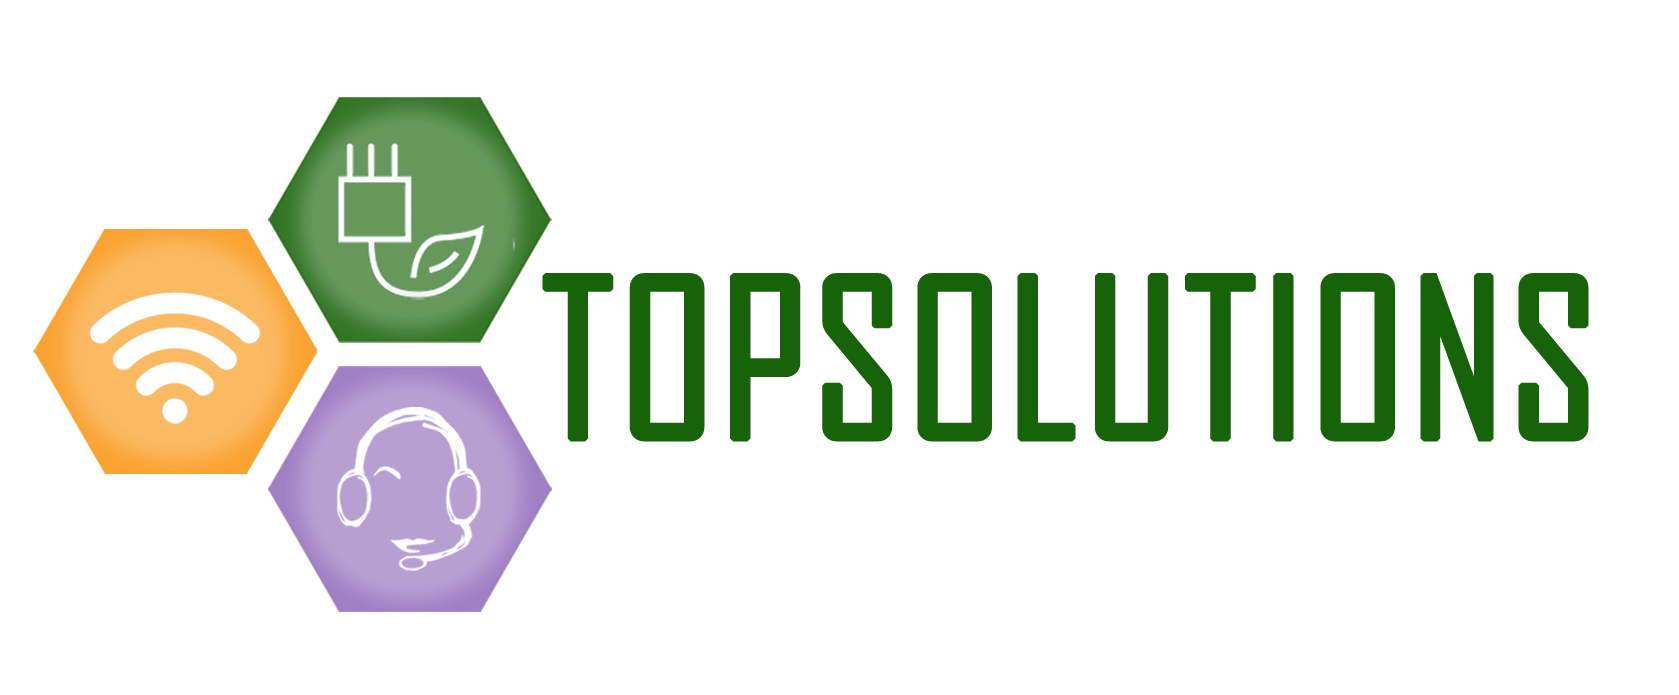 LOGO TopSolutions torino